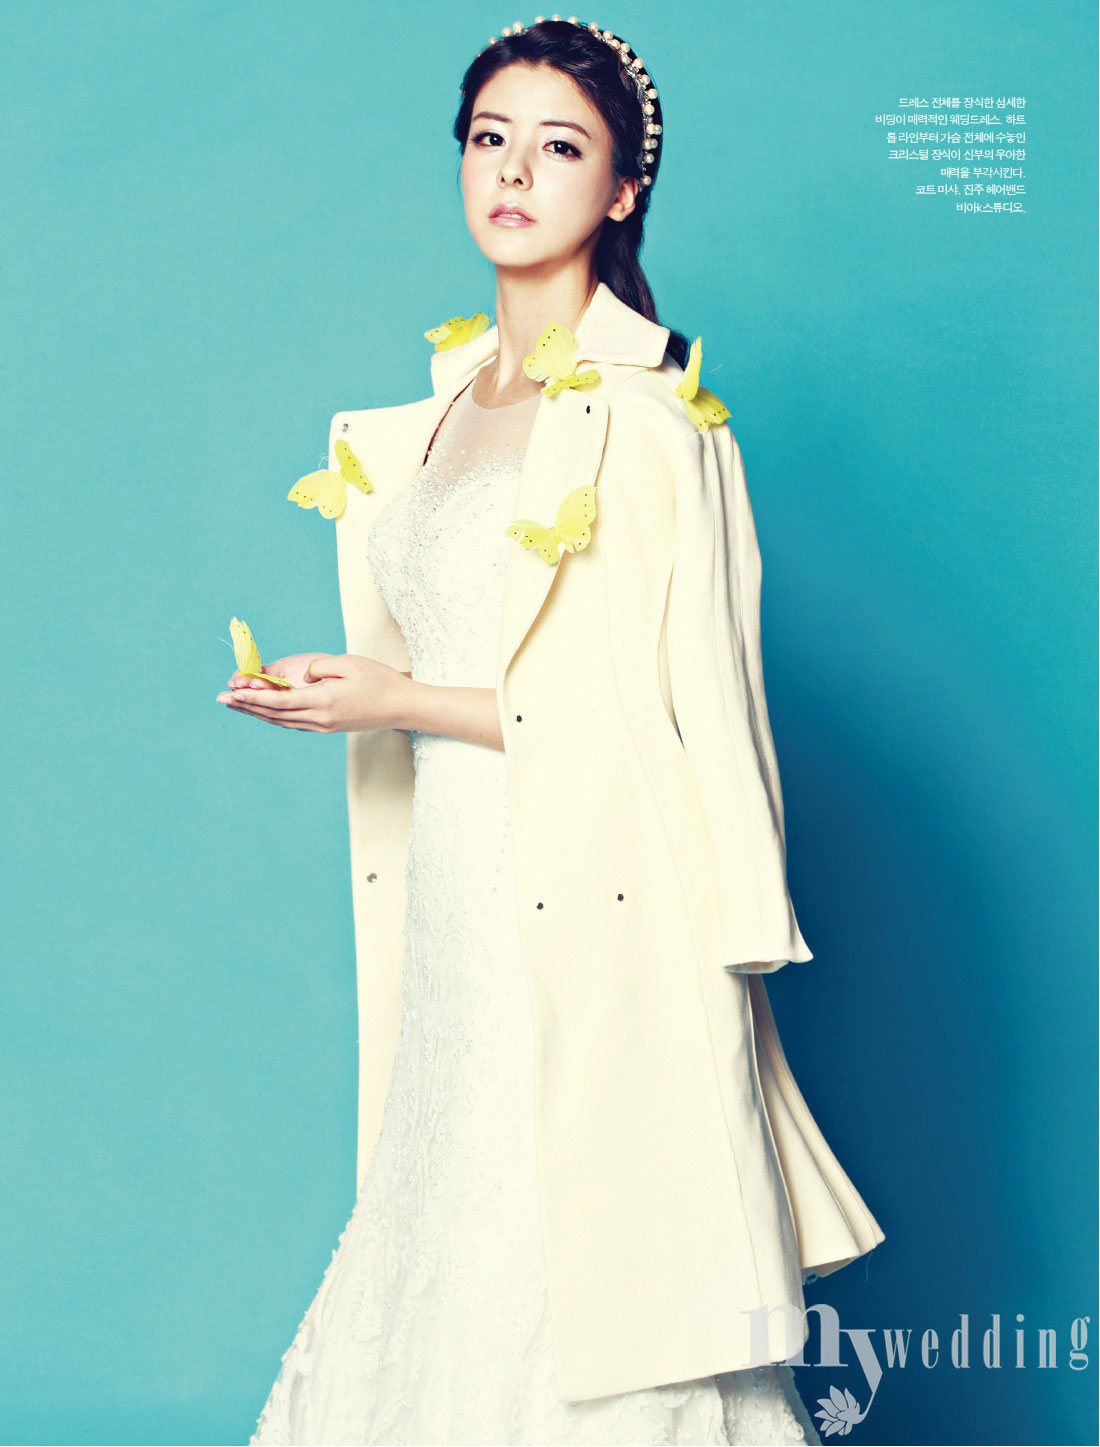 mina-fujii-wedding-magazine-4